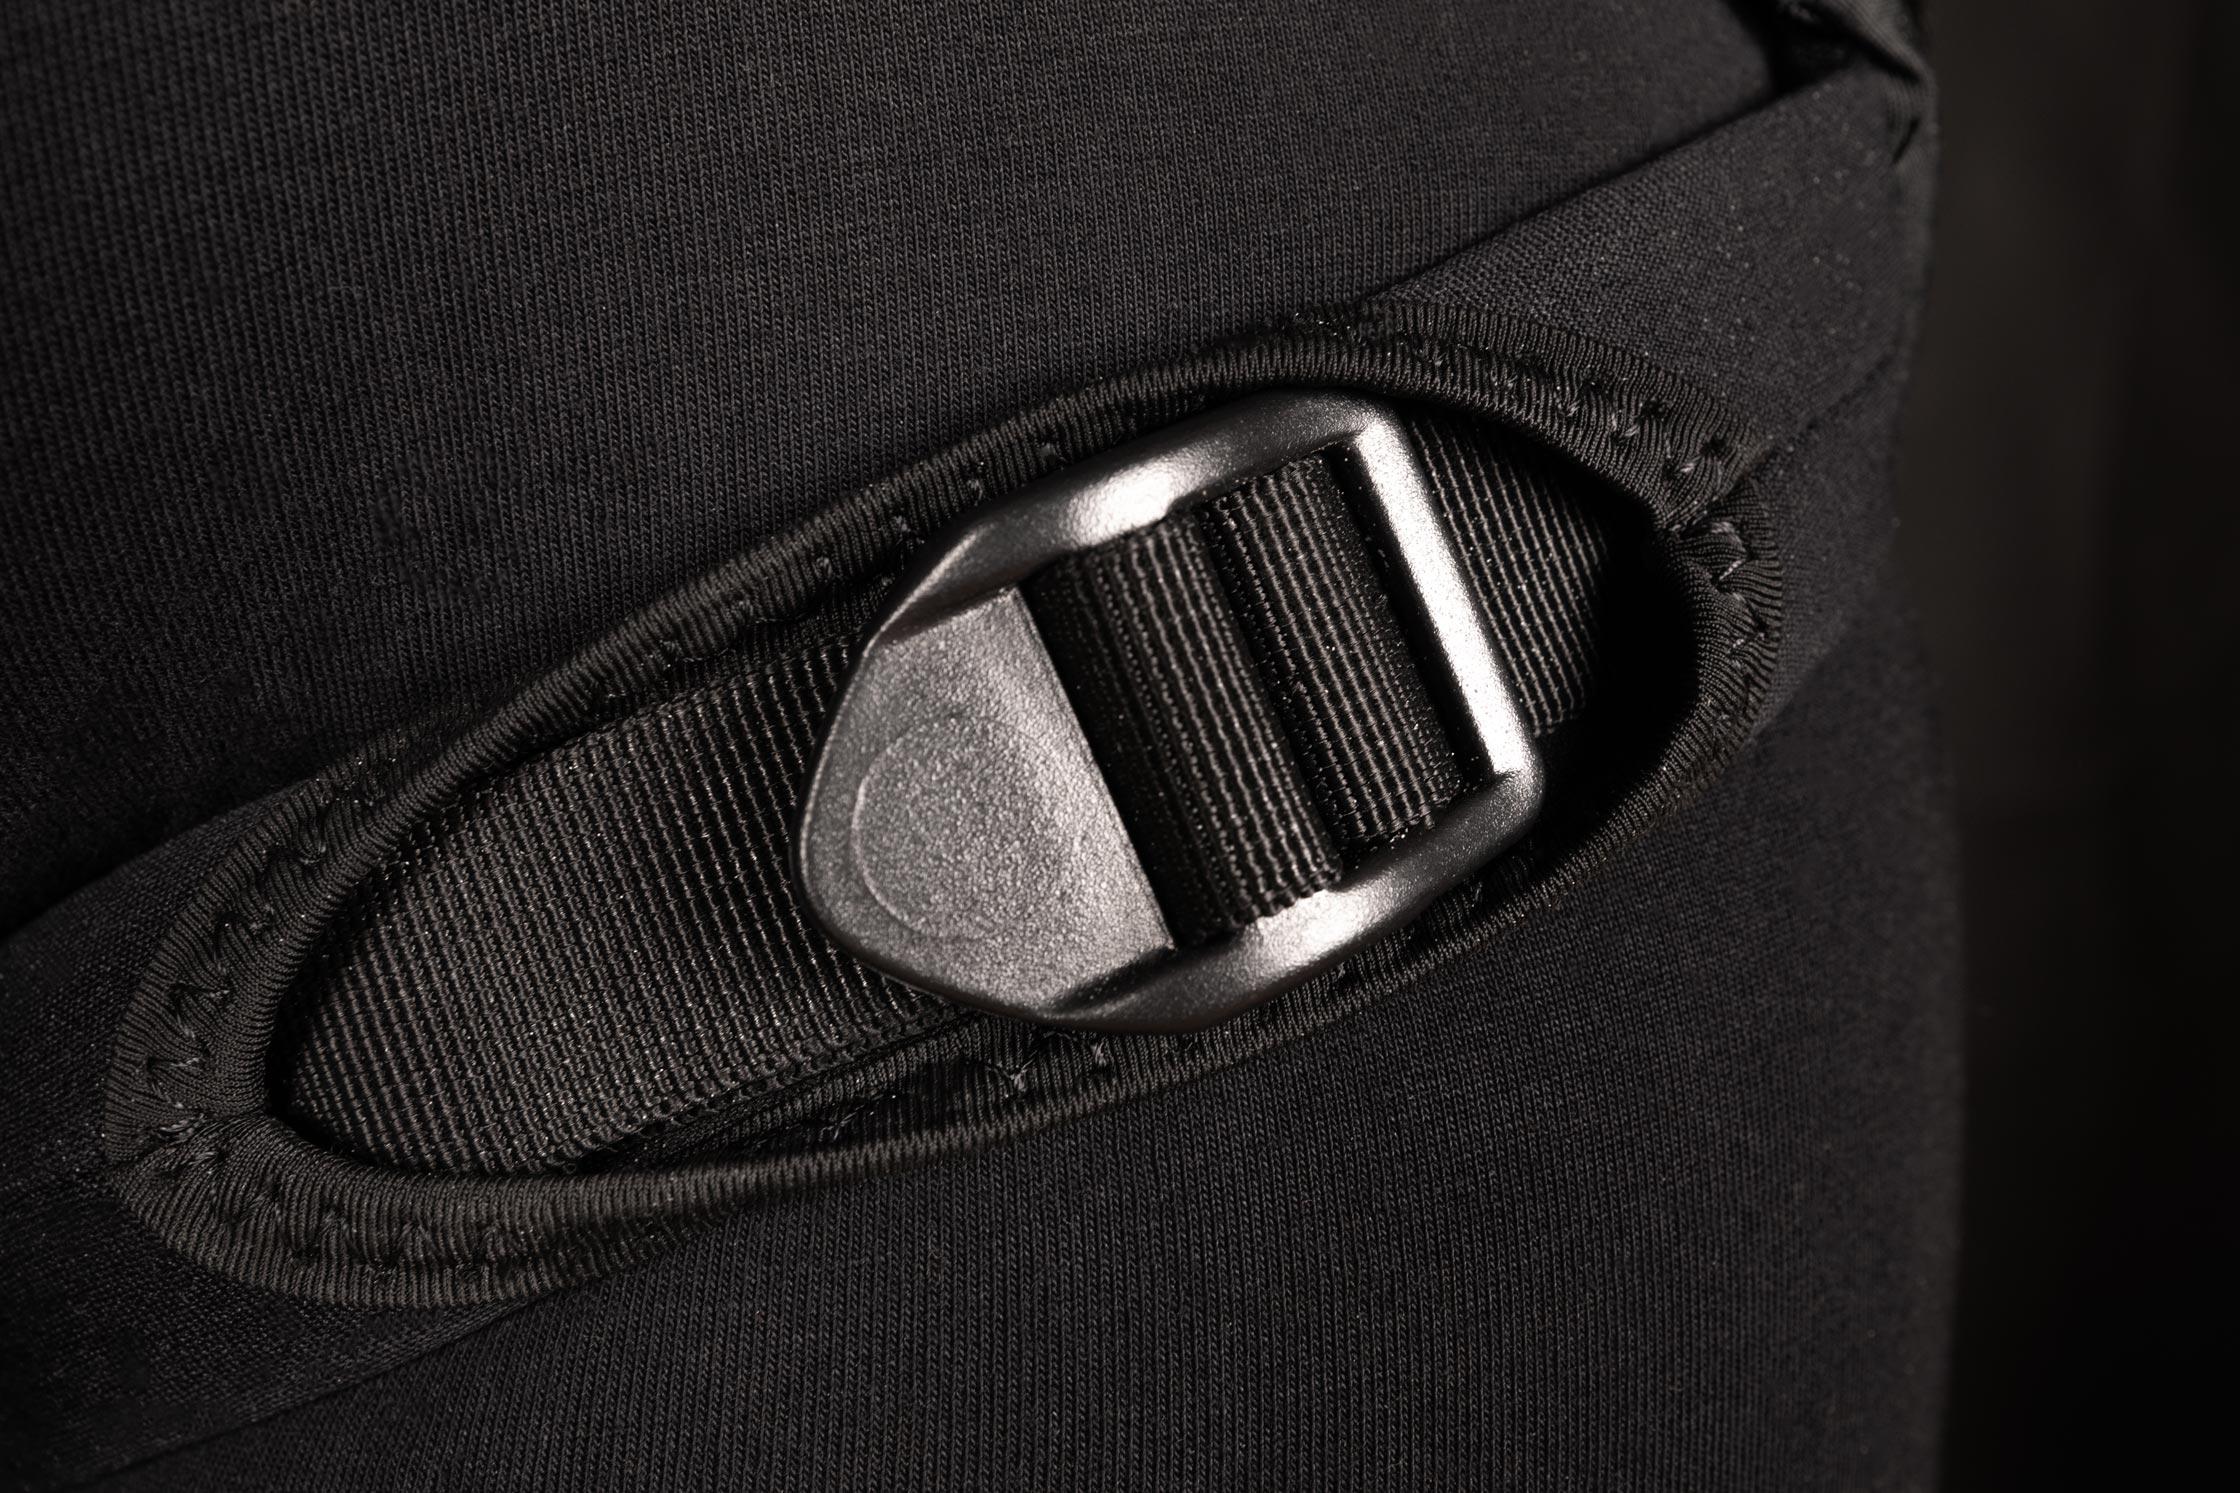 AK_EtherSeat-Harness_Adjustable-Leg-Straps